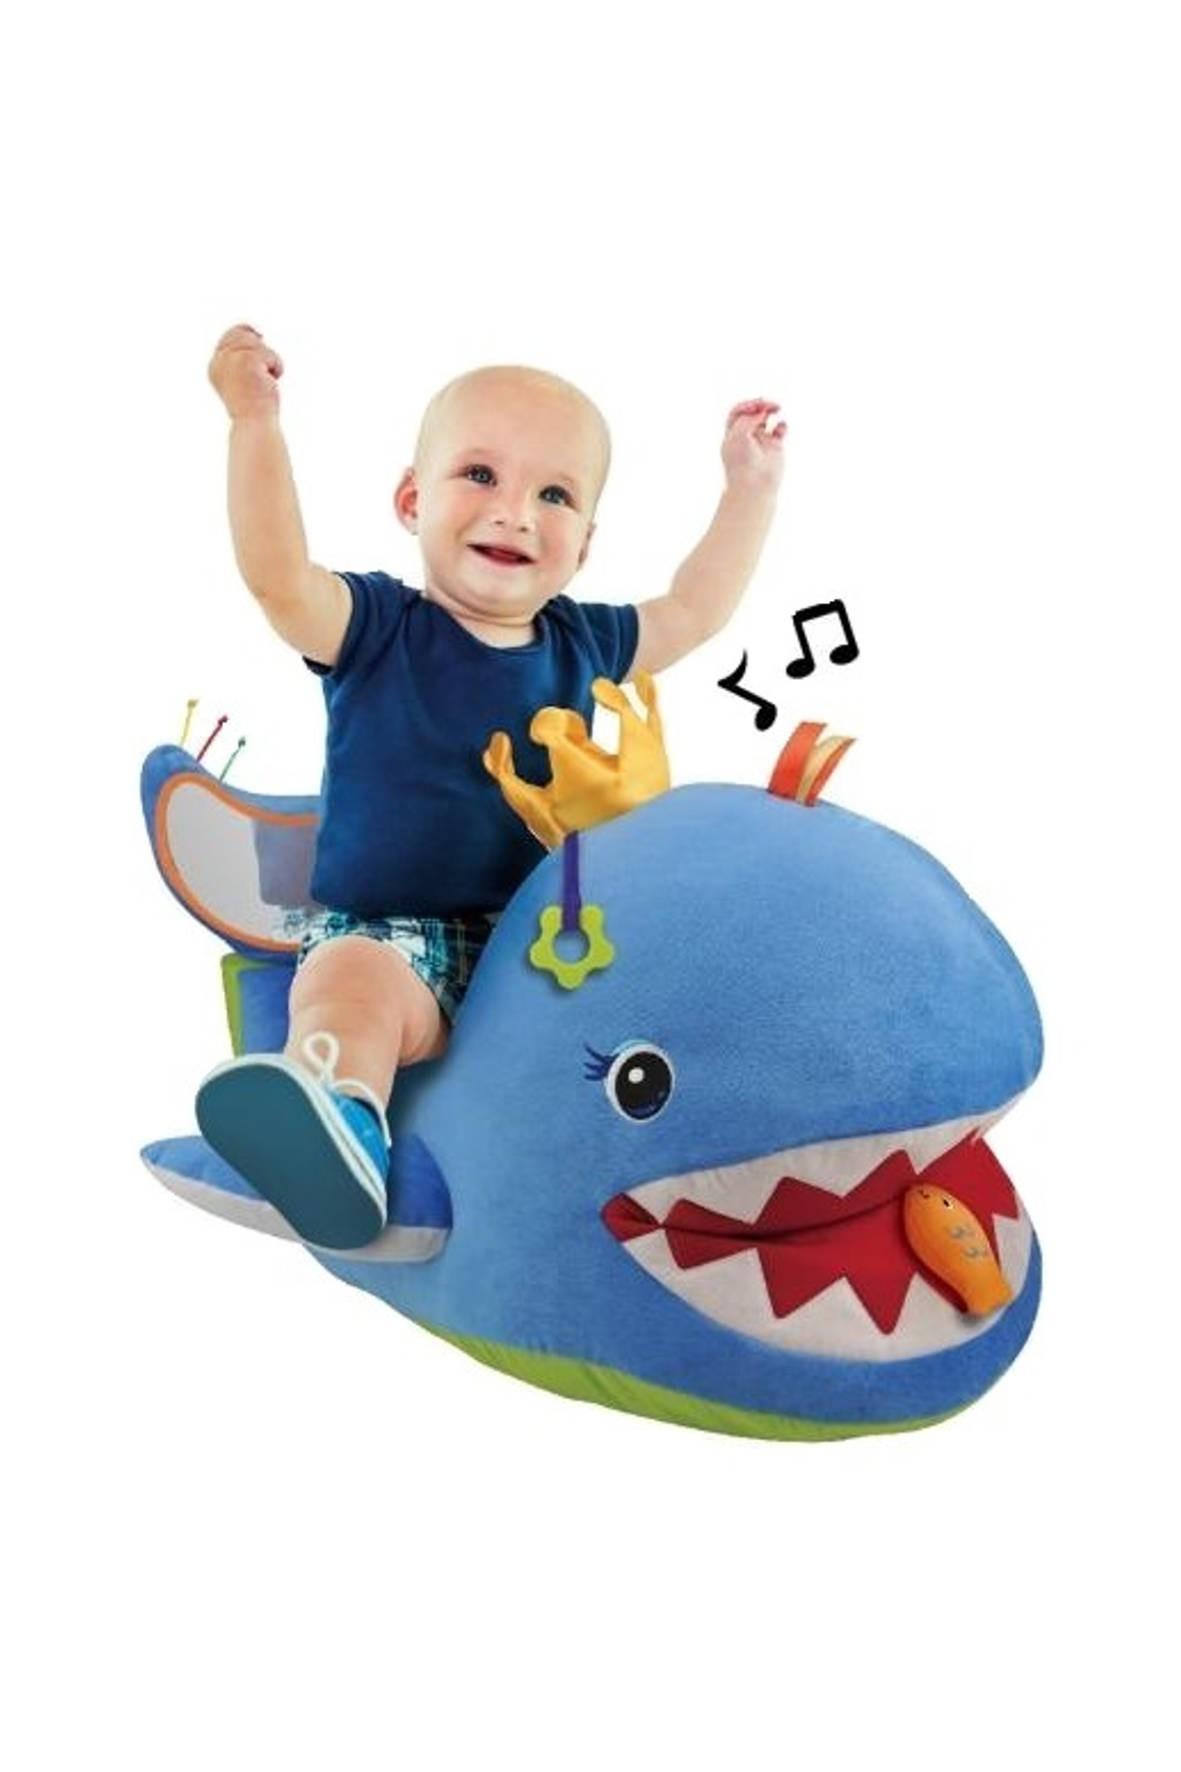 Wieloryb zabawka